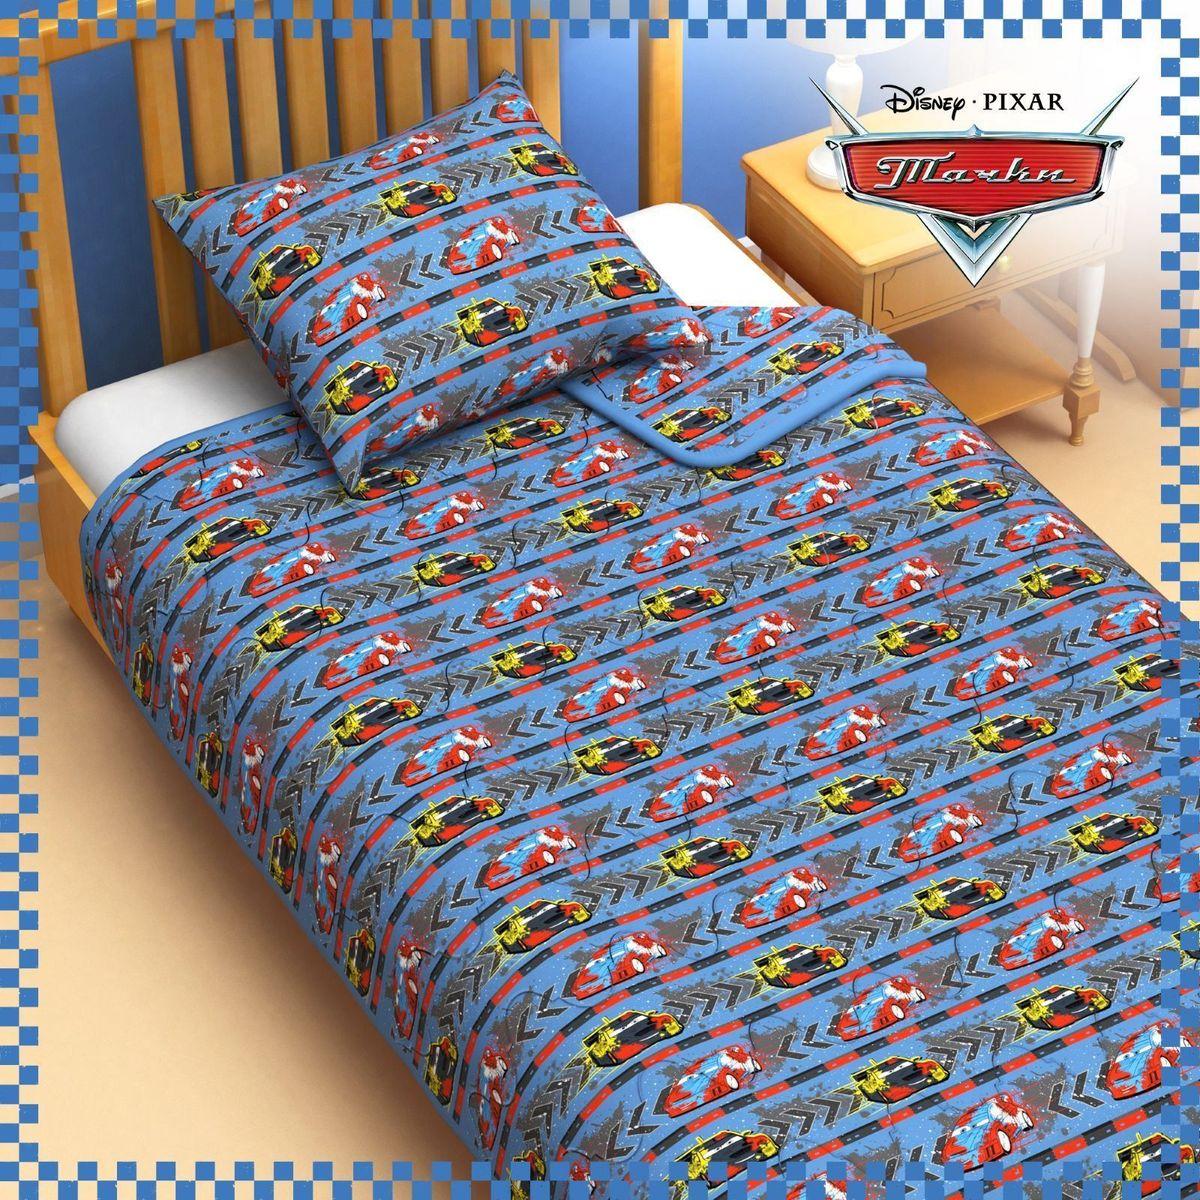 Disney Одеяло 1,5 спальное Тачки цвет голубой 140 х 205 см